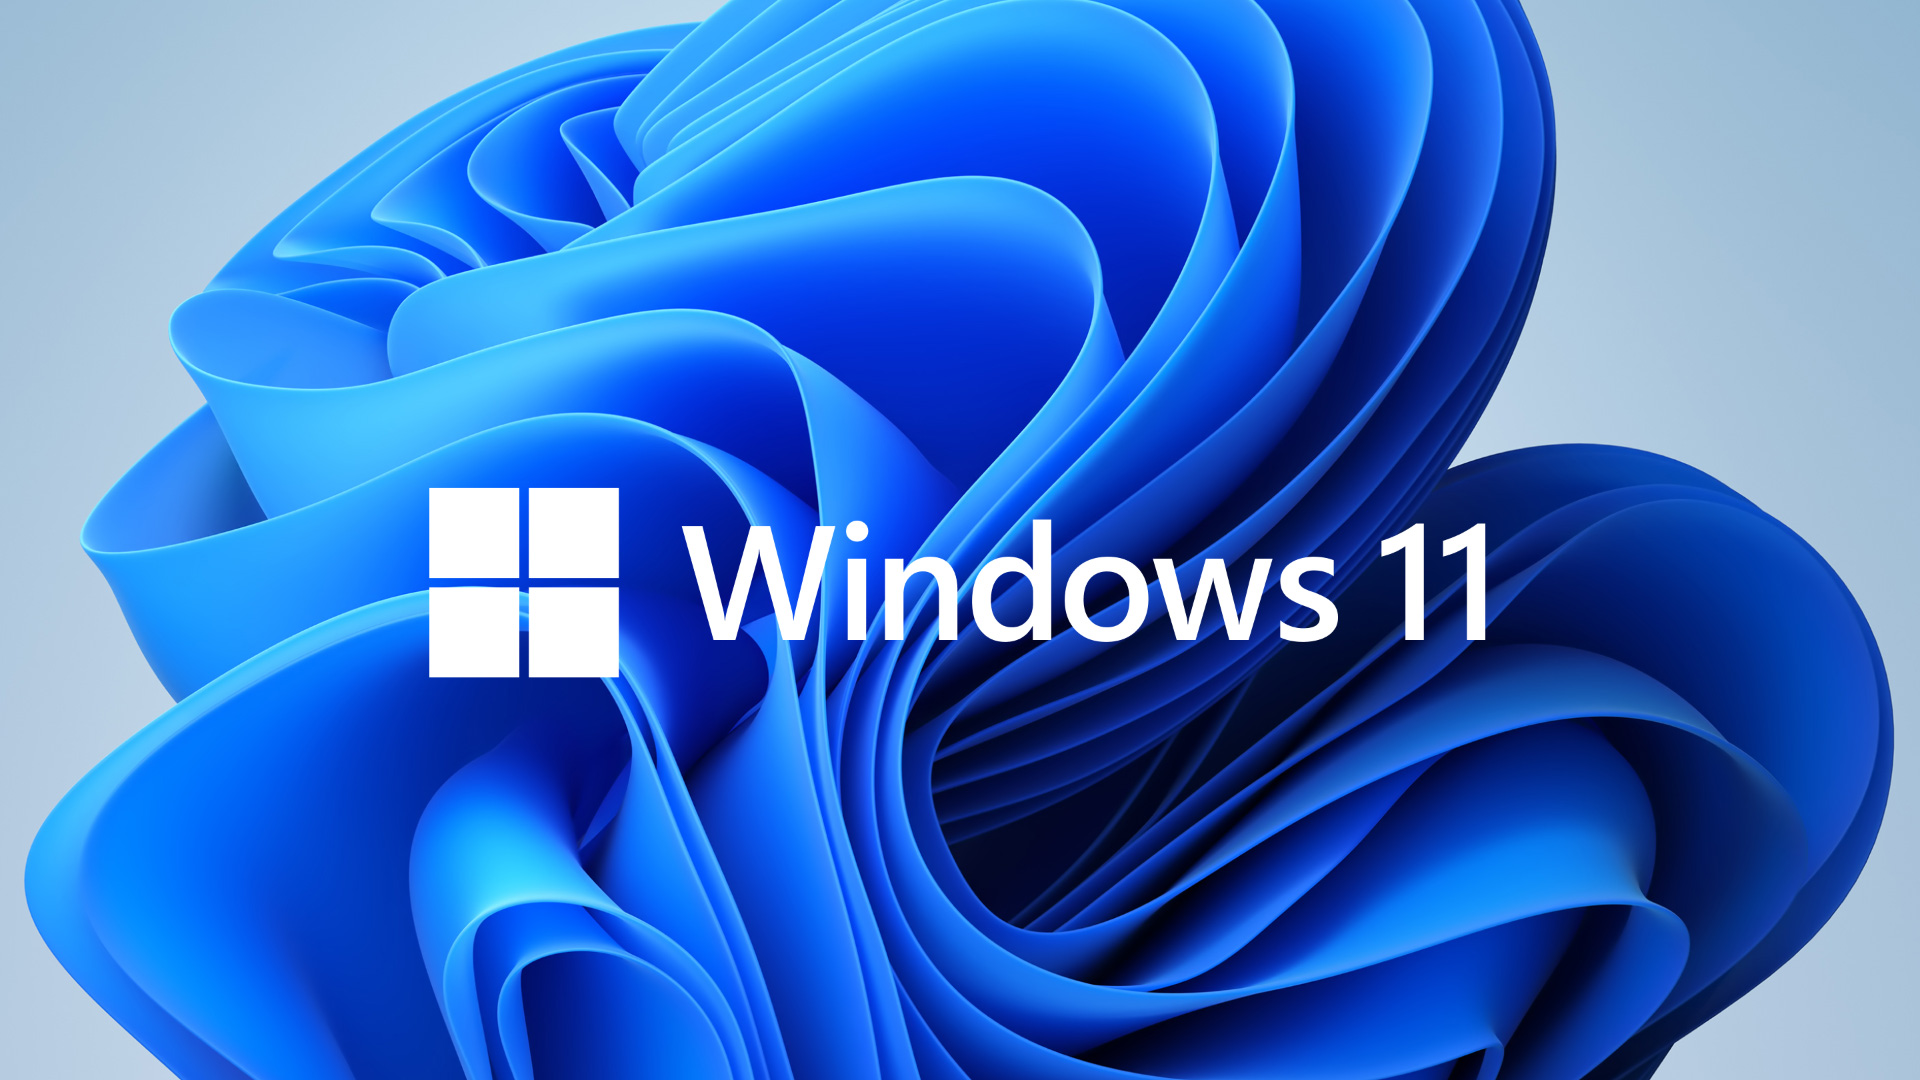 Windows 11 のロゴと装飾のある背景